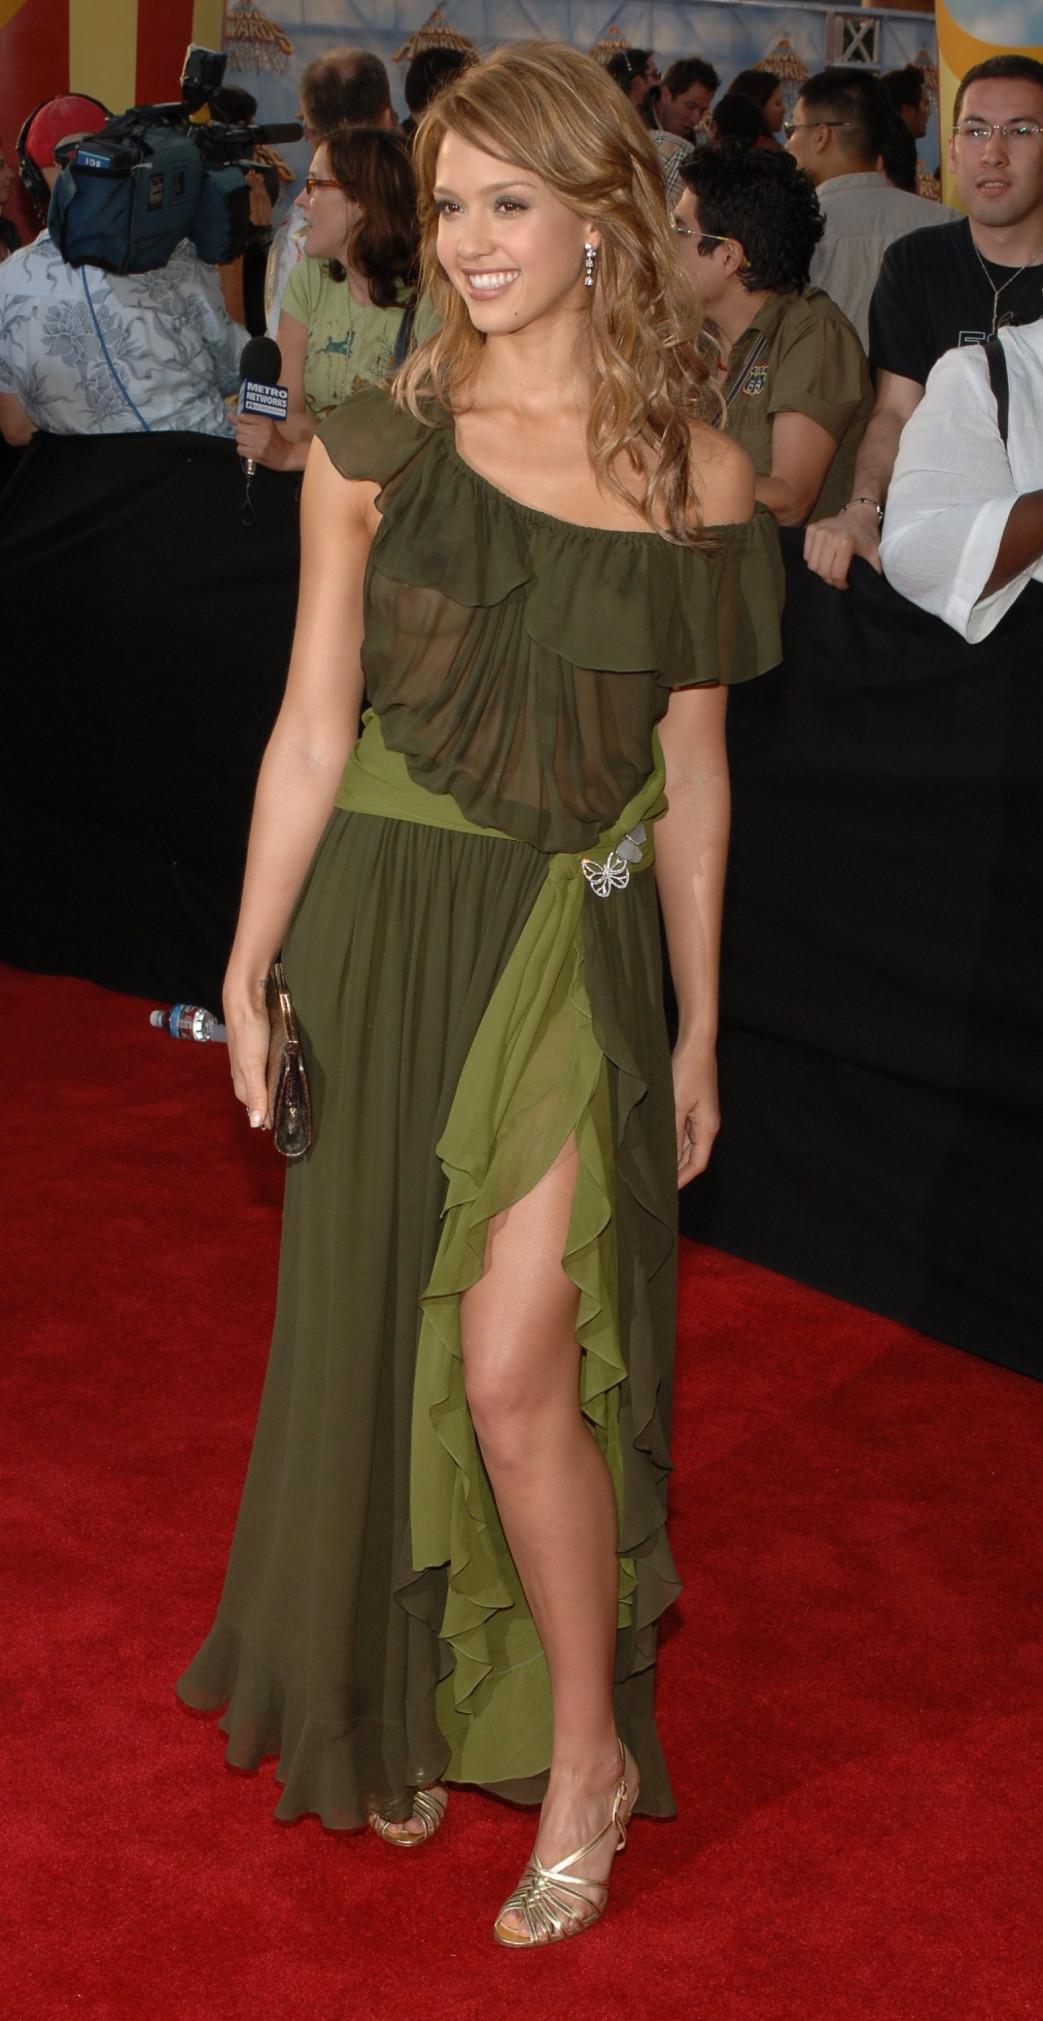 Jessica-Alba-Wardrobe-Malfuction-OOPS-Moments-20.jpg